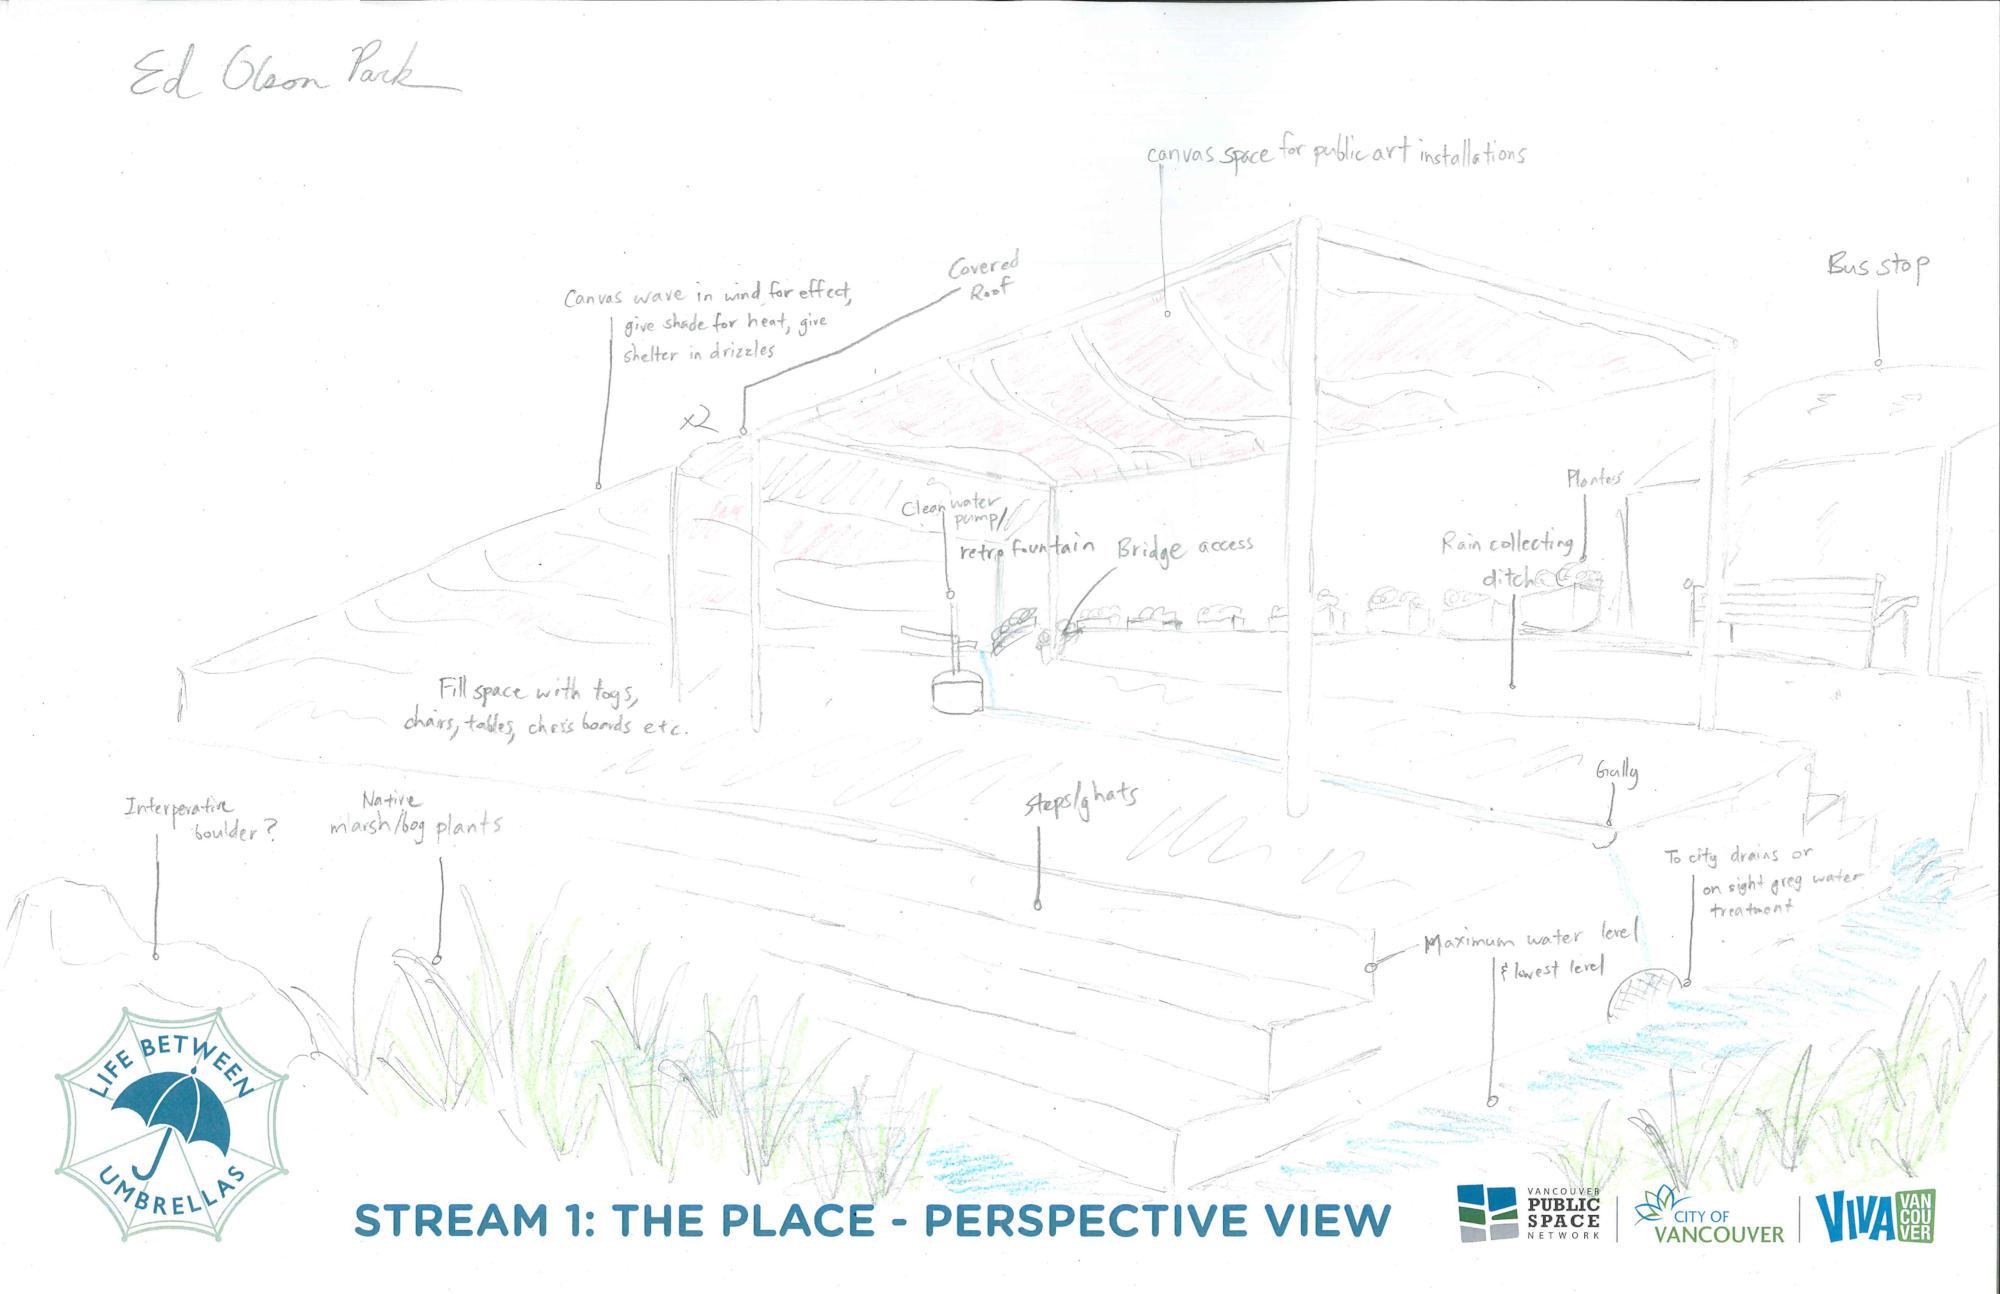 A34 - Ed Olson Park - Drawing-1.jpg